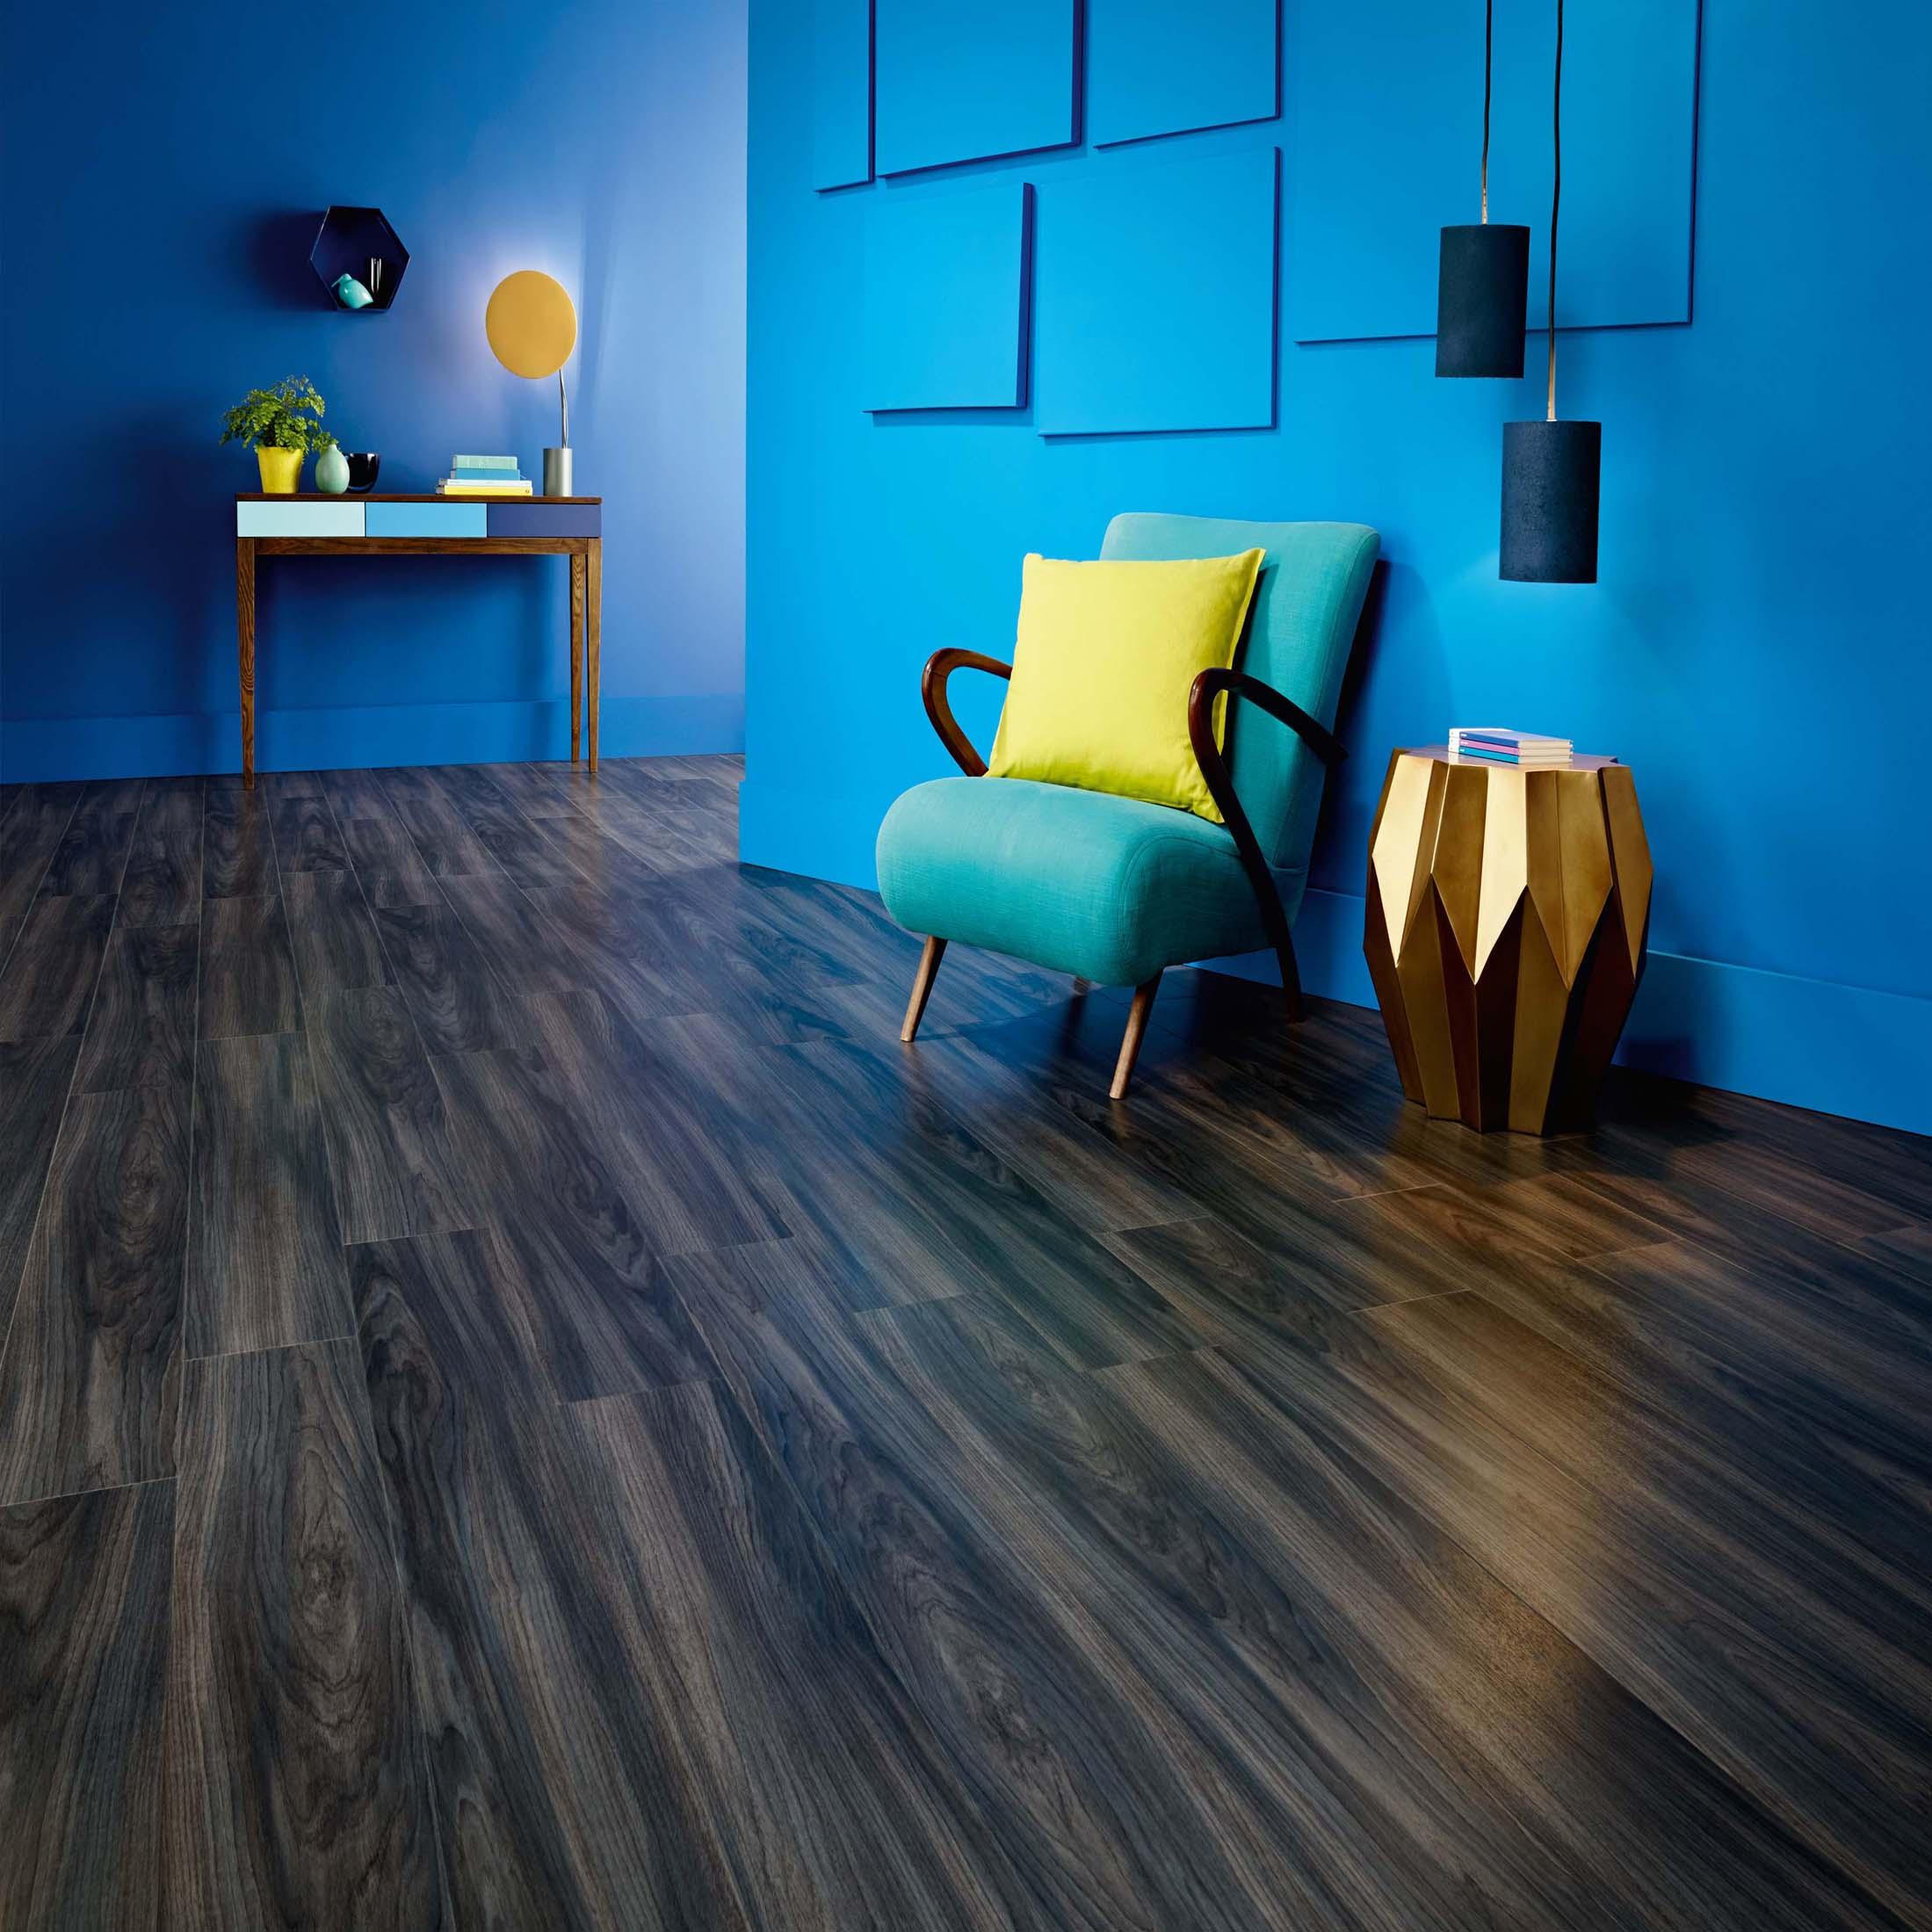 AR0W8230-Ink-Wash-Wood-Stripwood-Hallway-Sept-15-CMYK